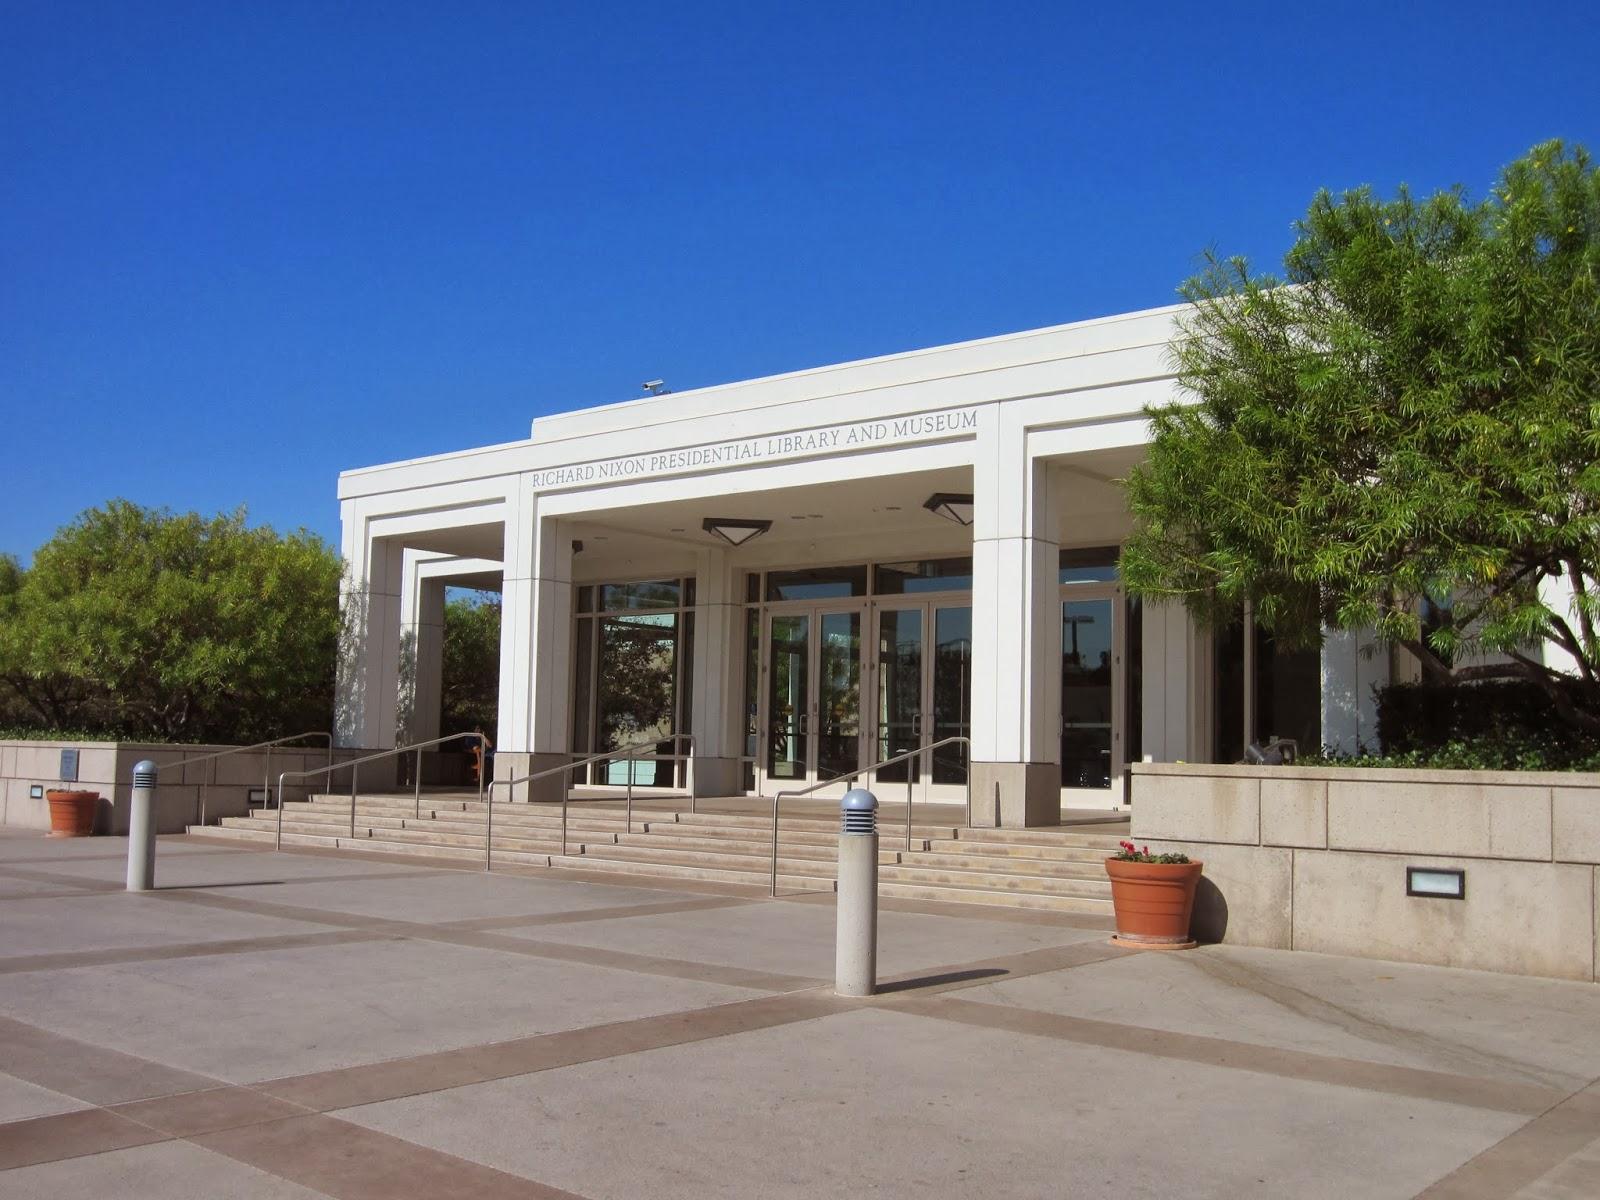 Whittier College Tuition >> Souvenir Chronicles: YORBA LINDA, CALIFORNIA: RICHARD NIXON PRESIDENTIAL LIBRARY, Part 1, Nixon ...